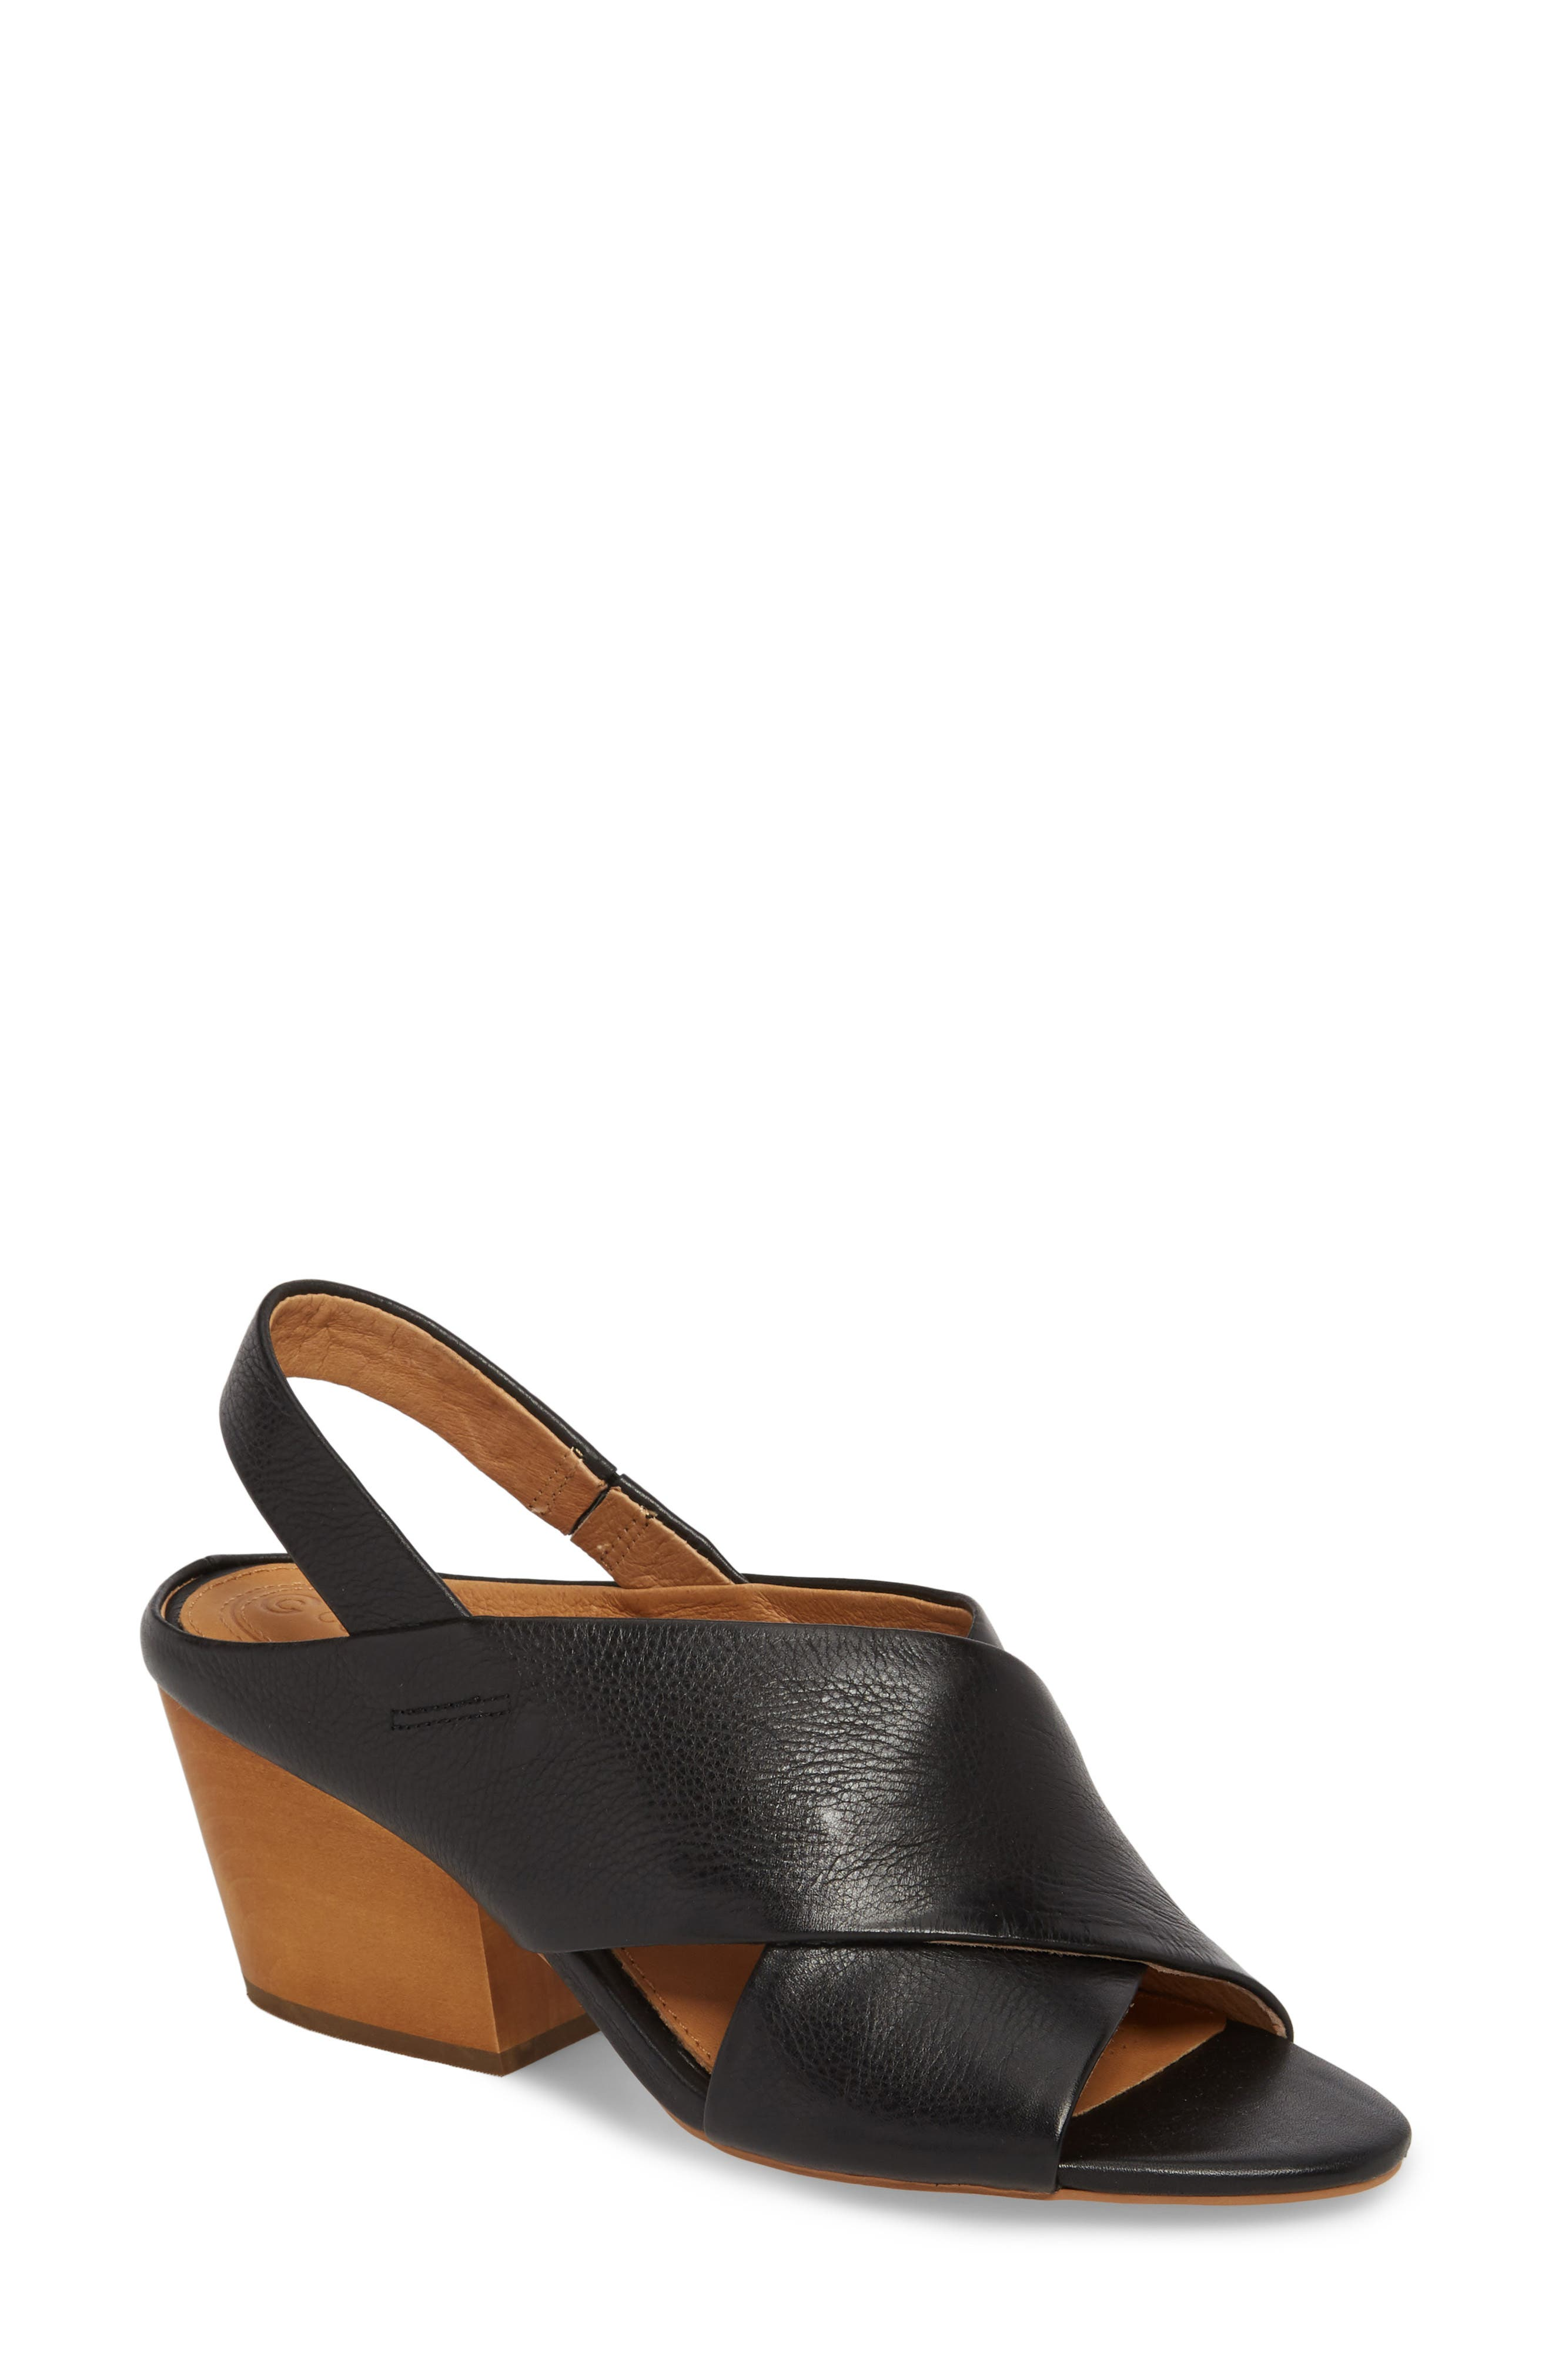 Irit Sandal,                         Main,                         color, BLACK LEATHER